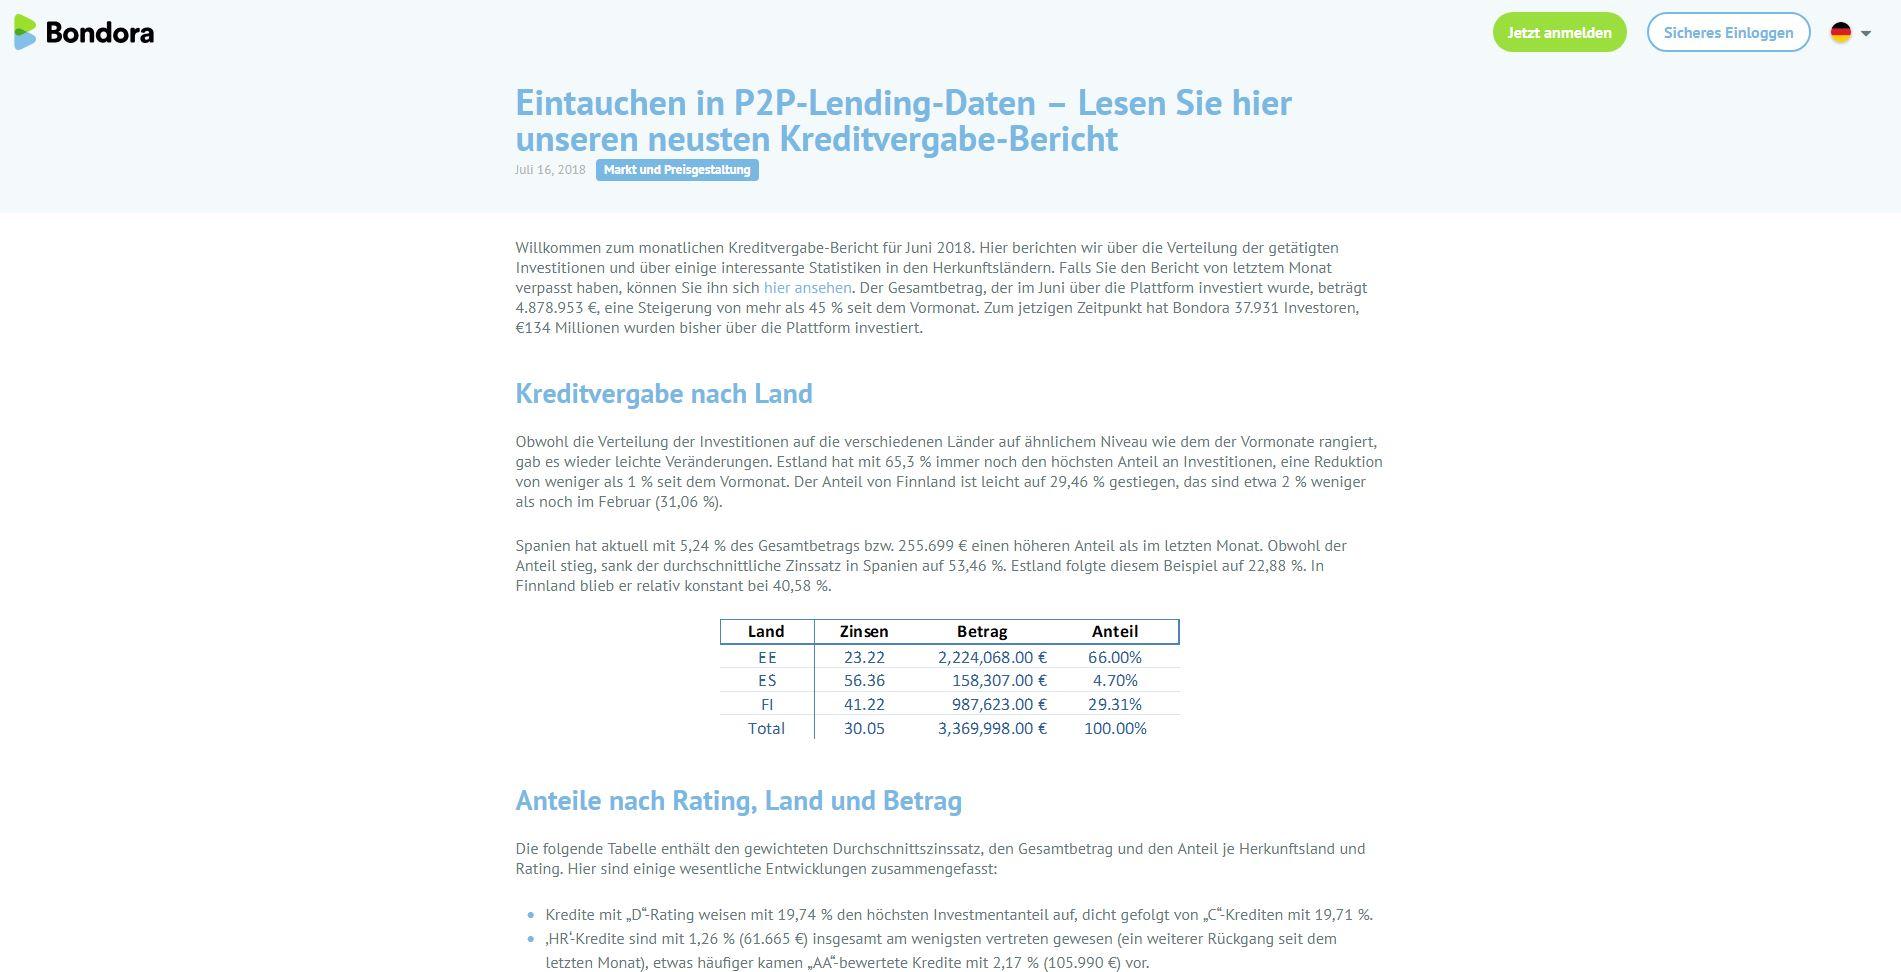 bondora-kreditvergabe-bericht-blog.JPG